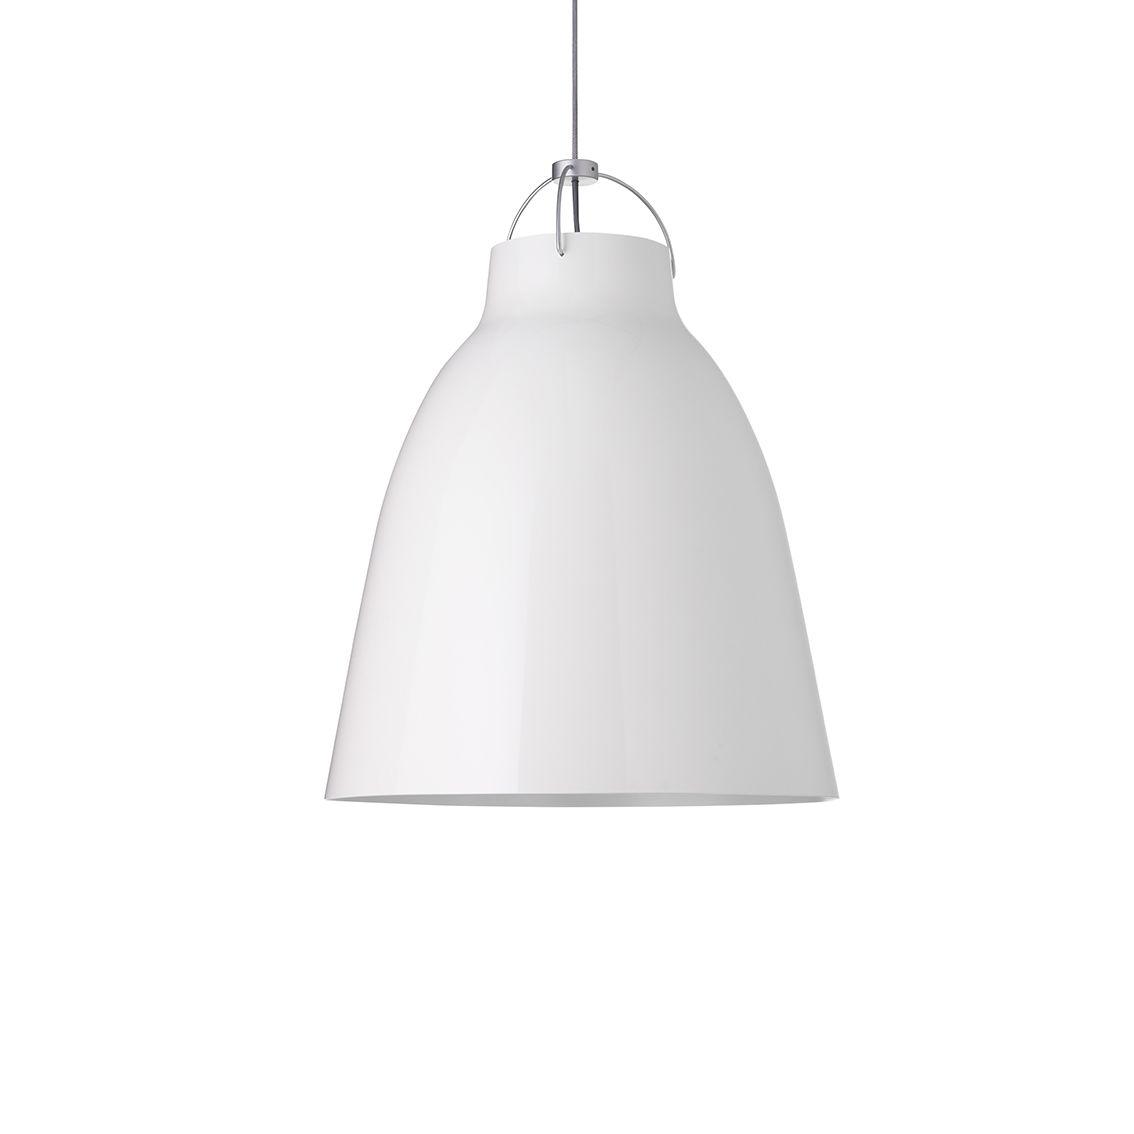 Caravaggio hanglamp Lightyears Ø16 hoogglans wit